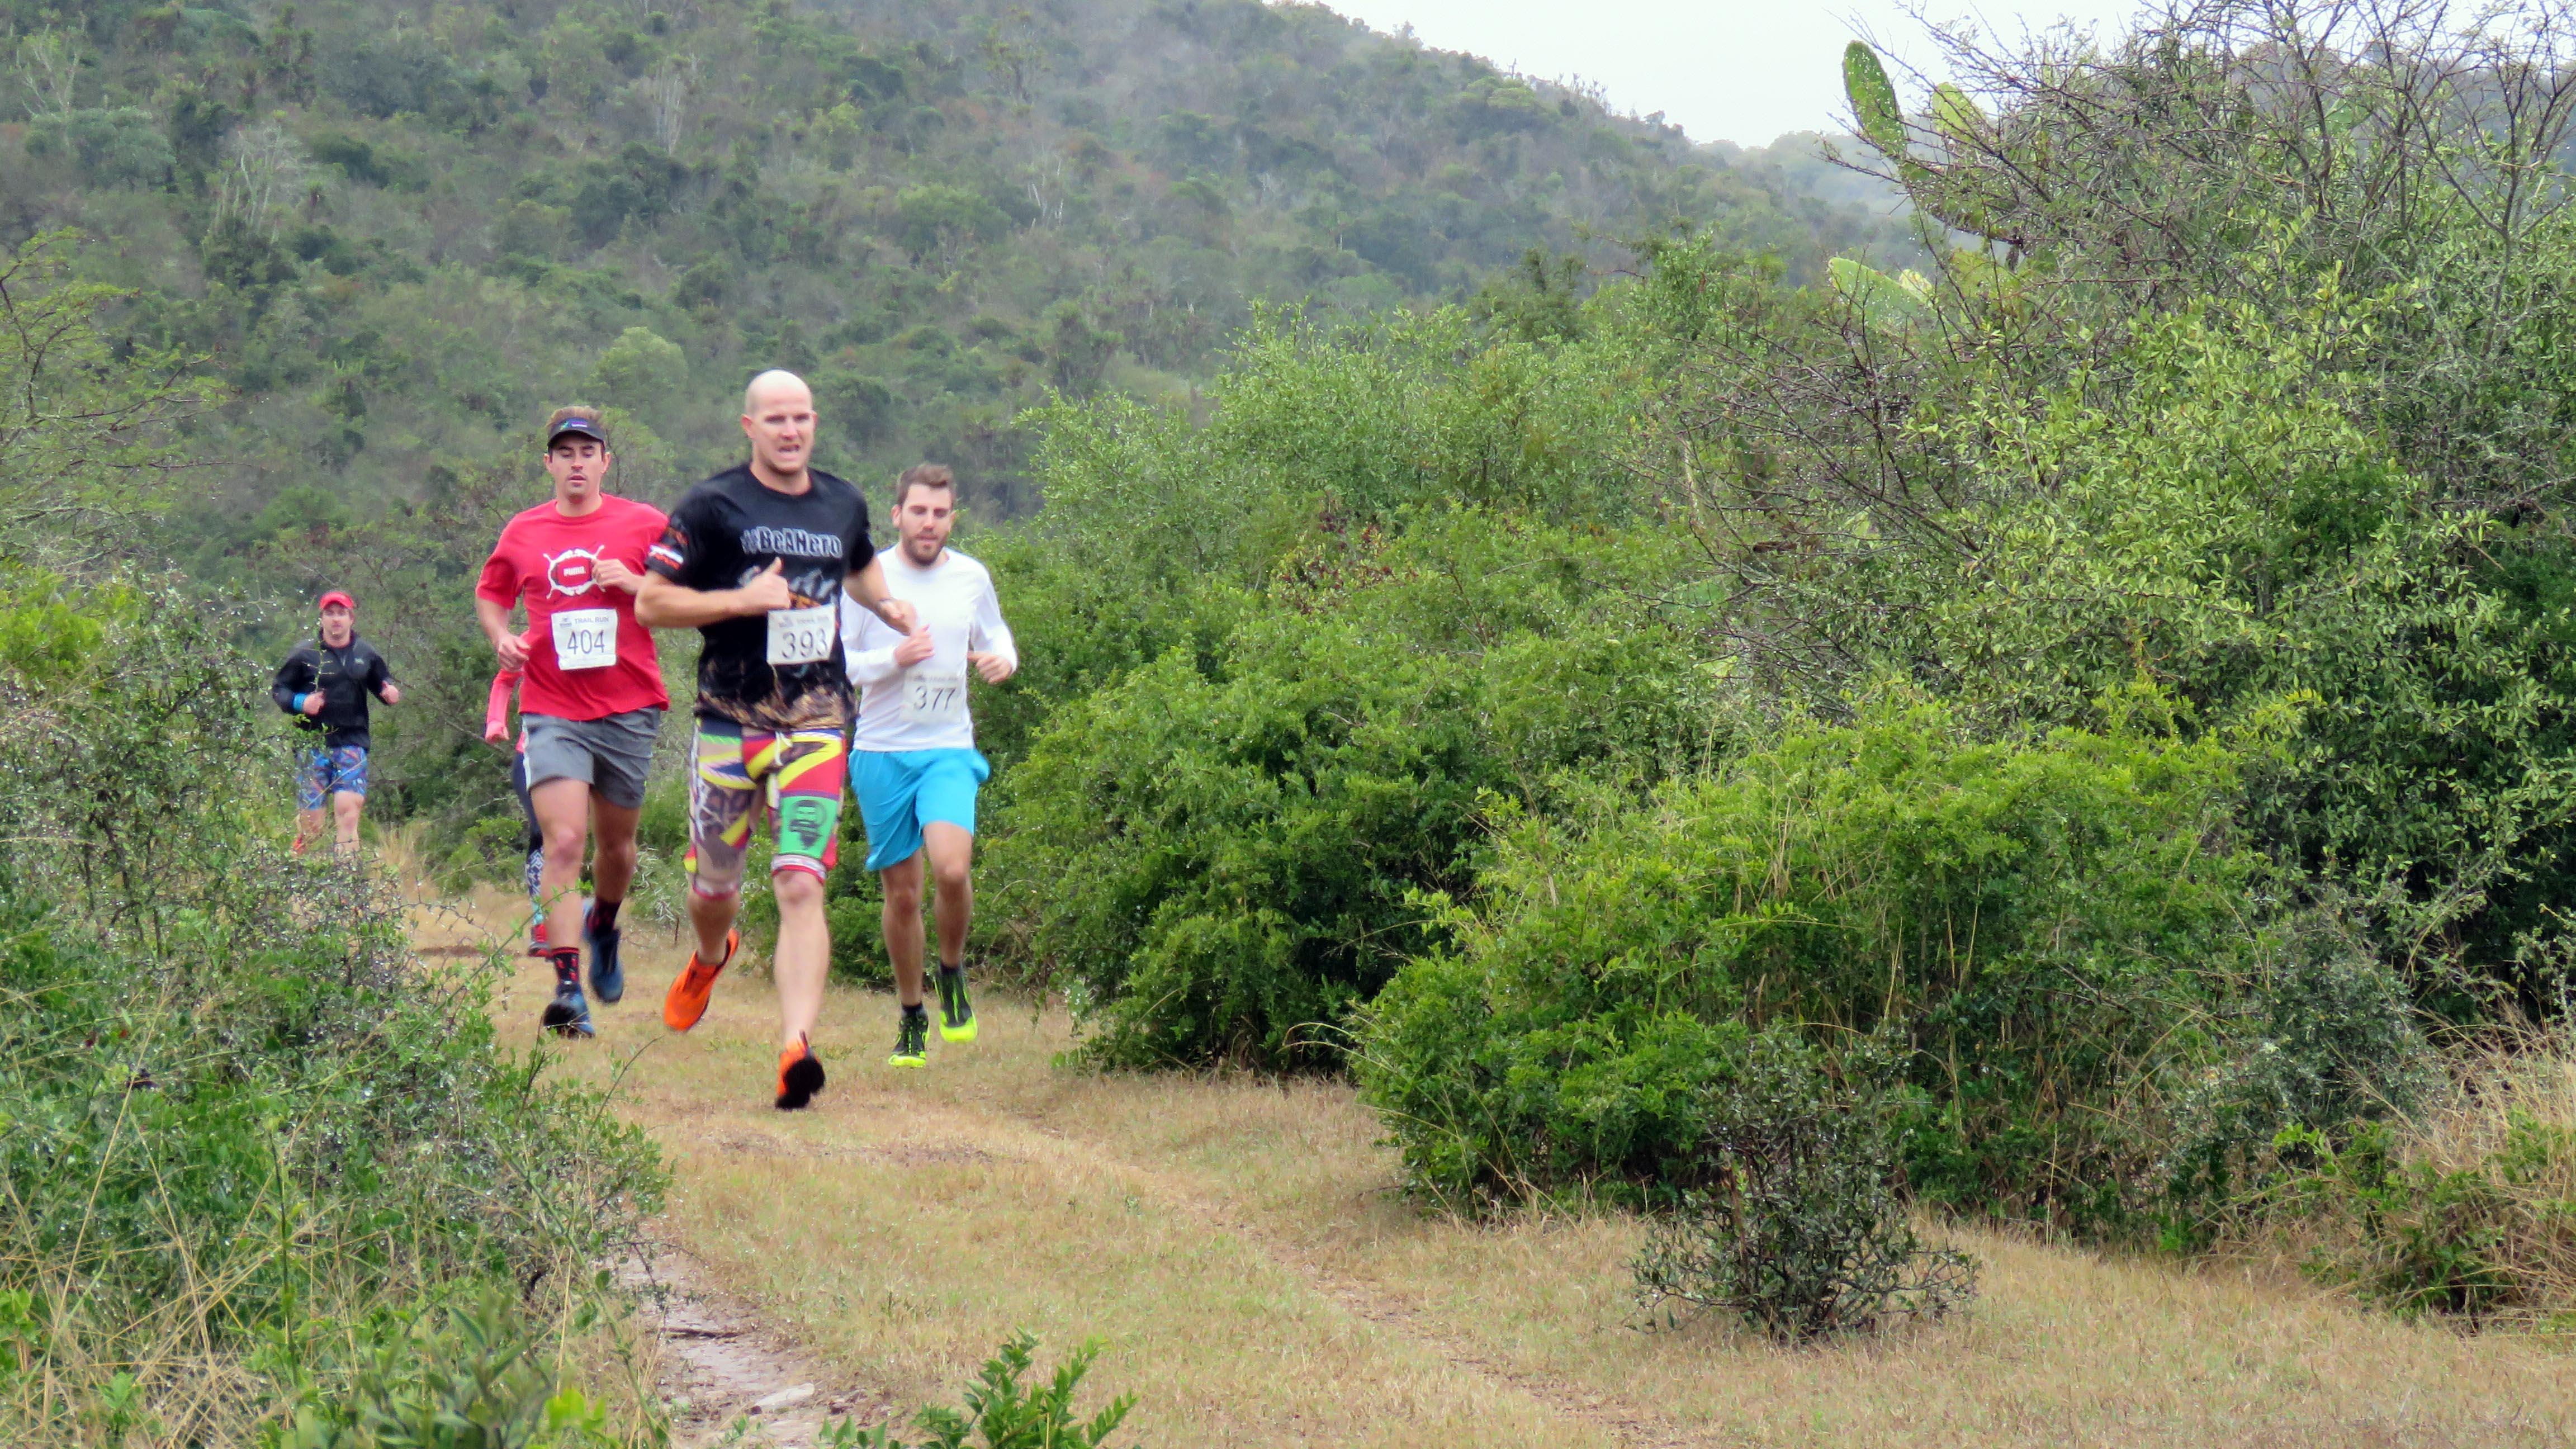 hayterdale trailrun 2018-08-05  (17)